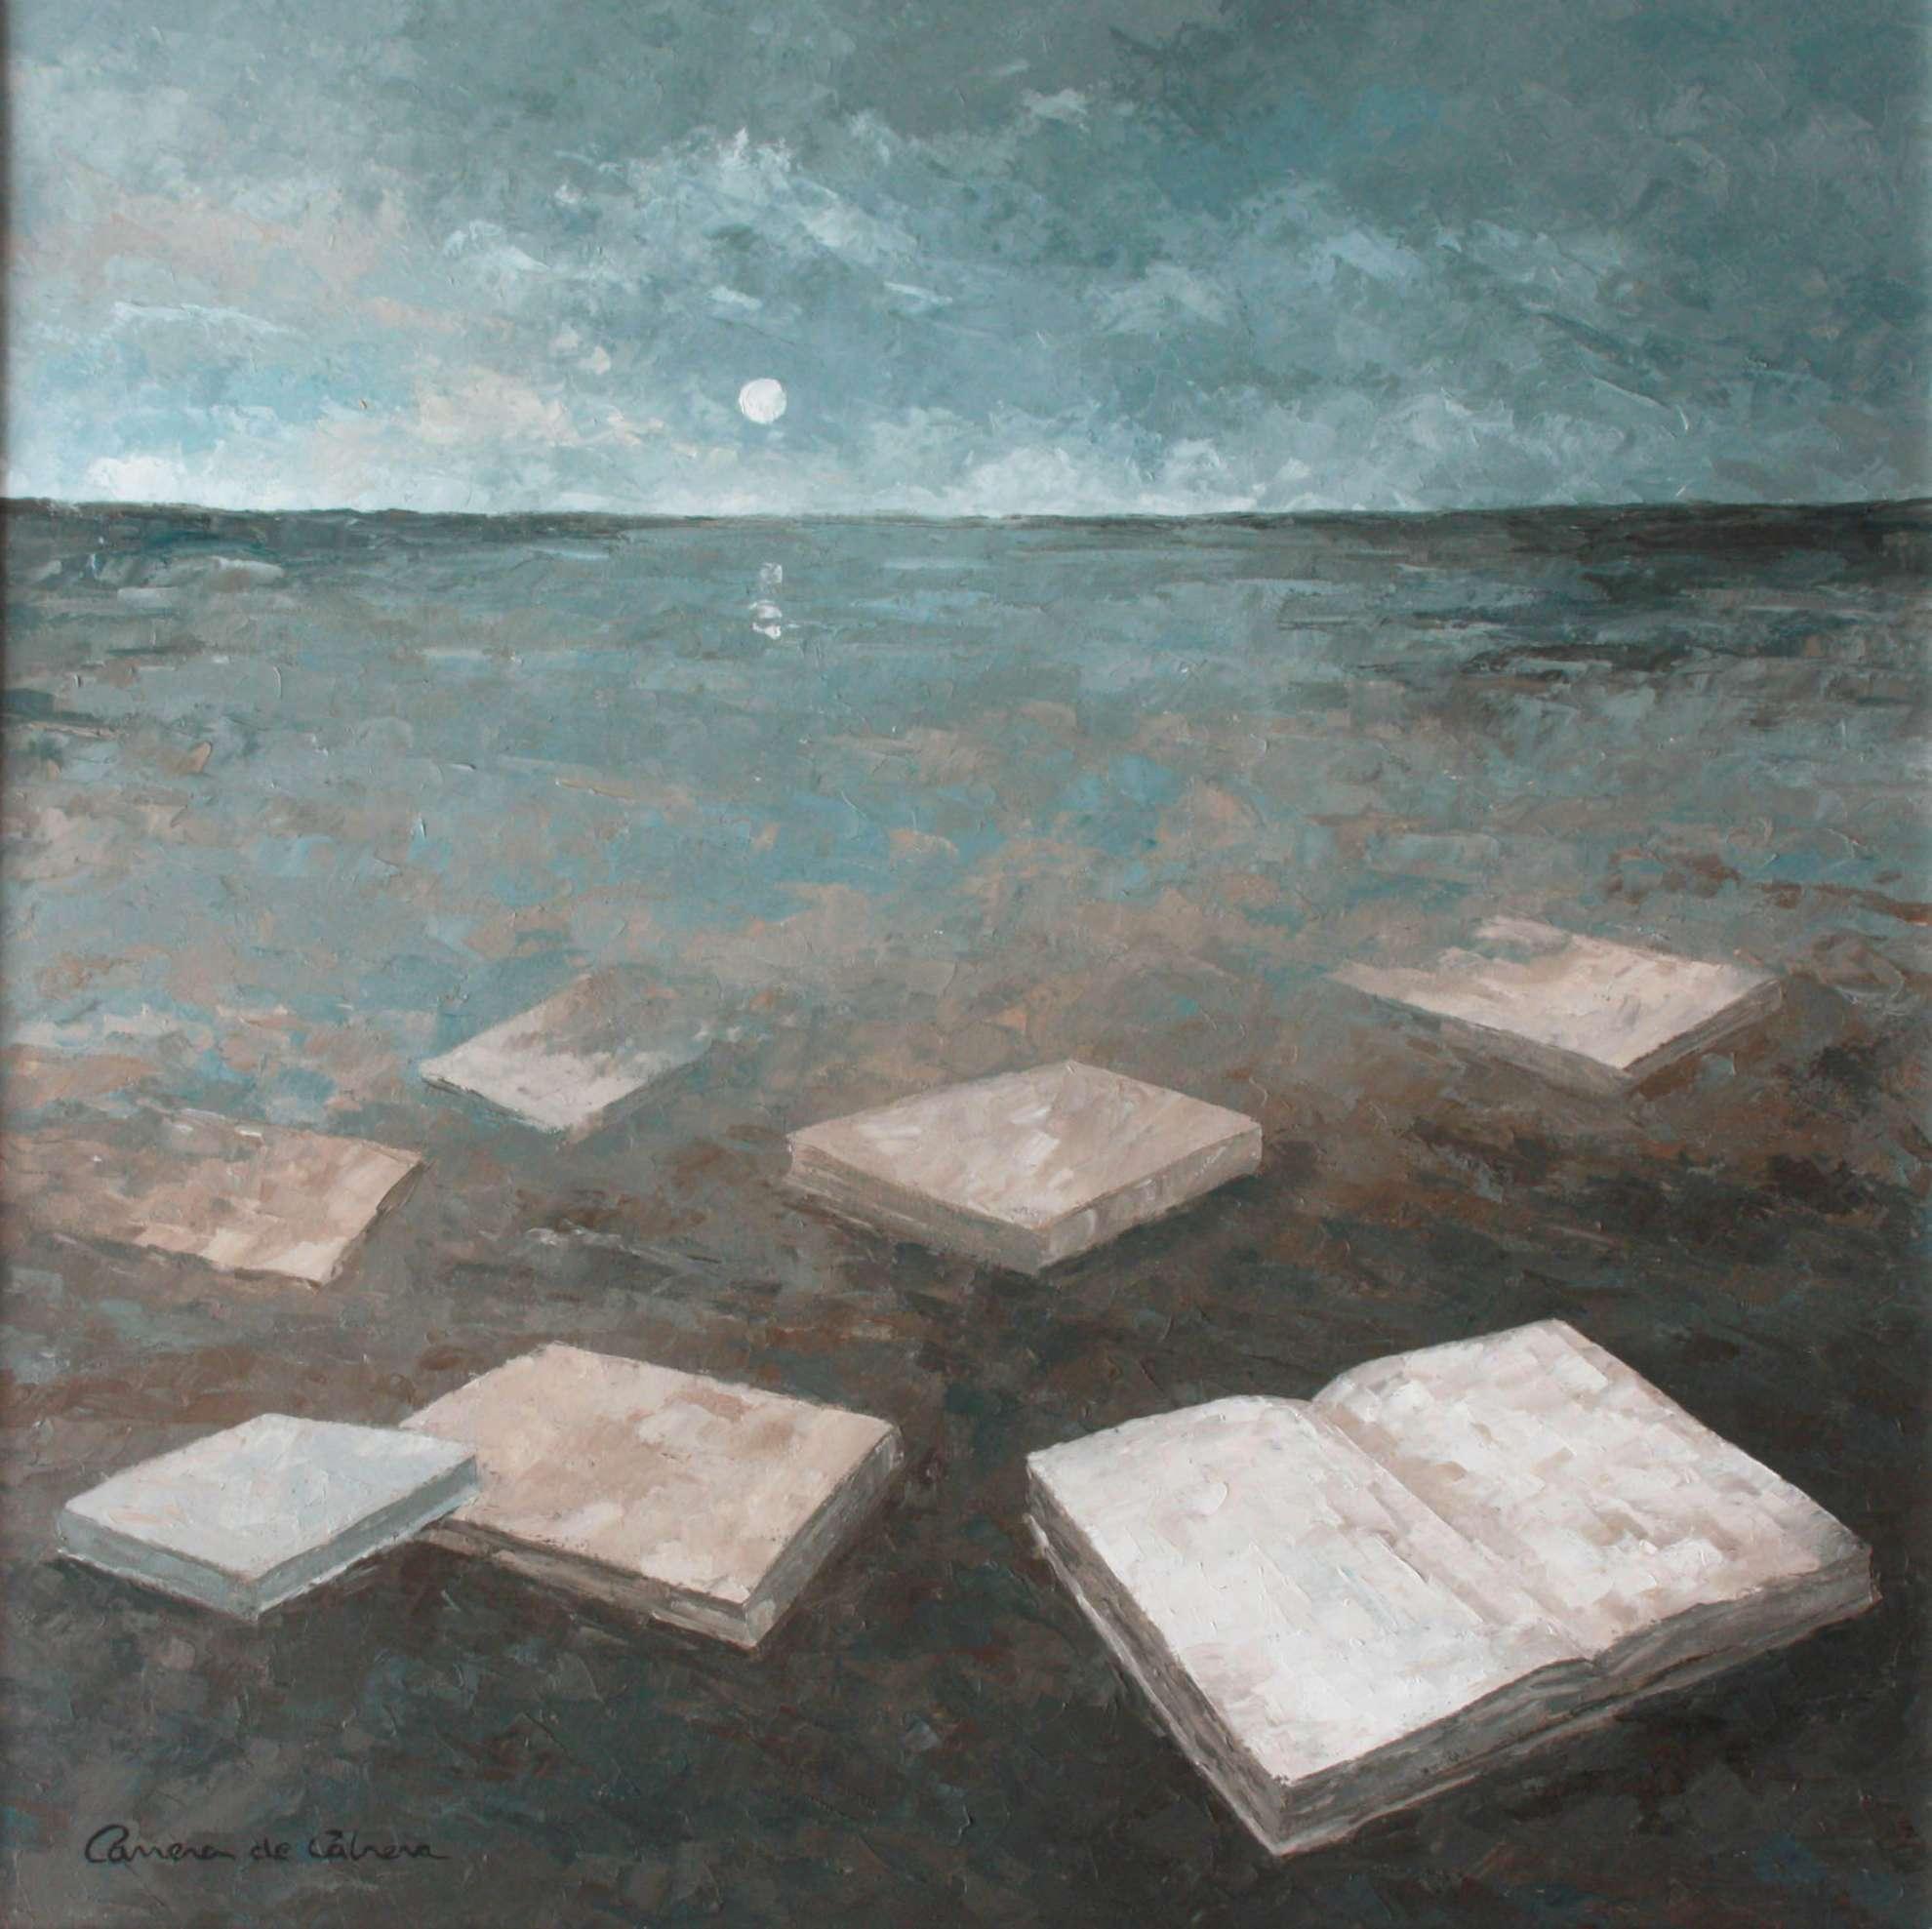 El mar en la nit per sempre